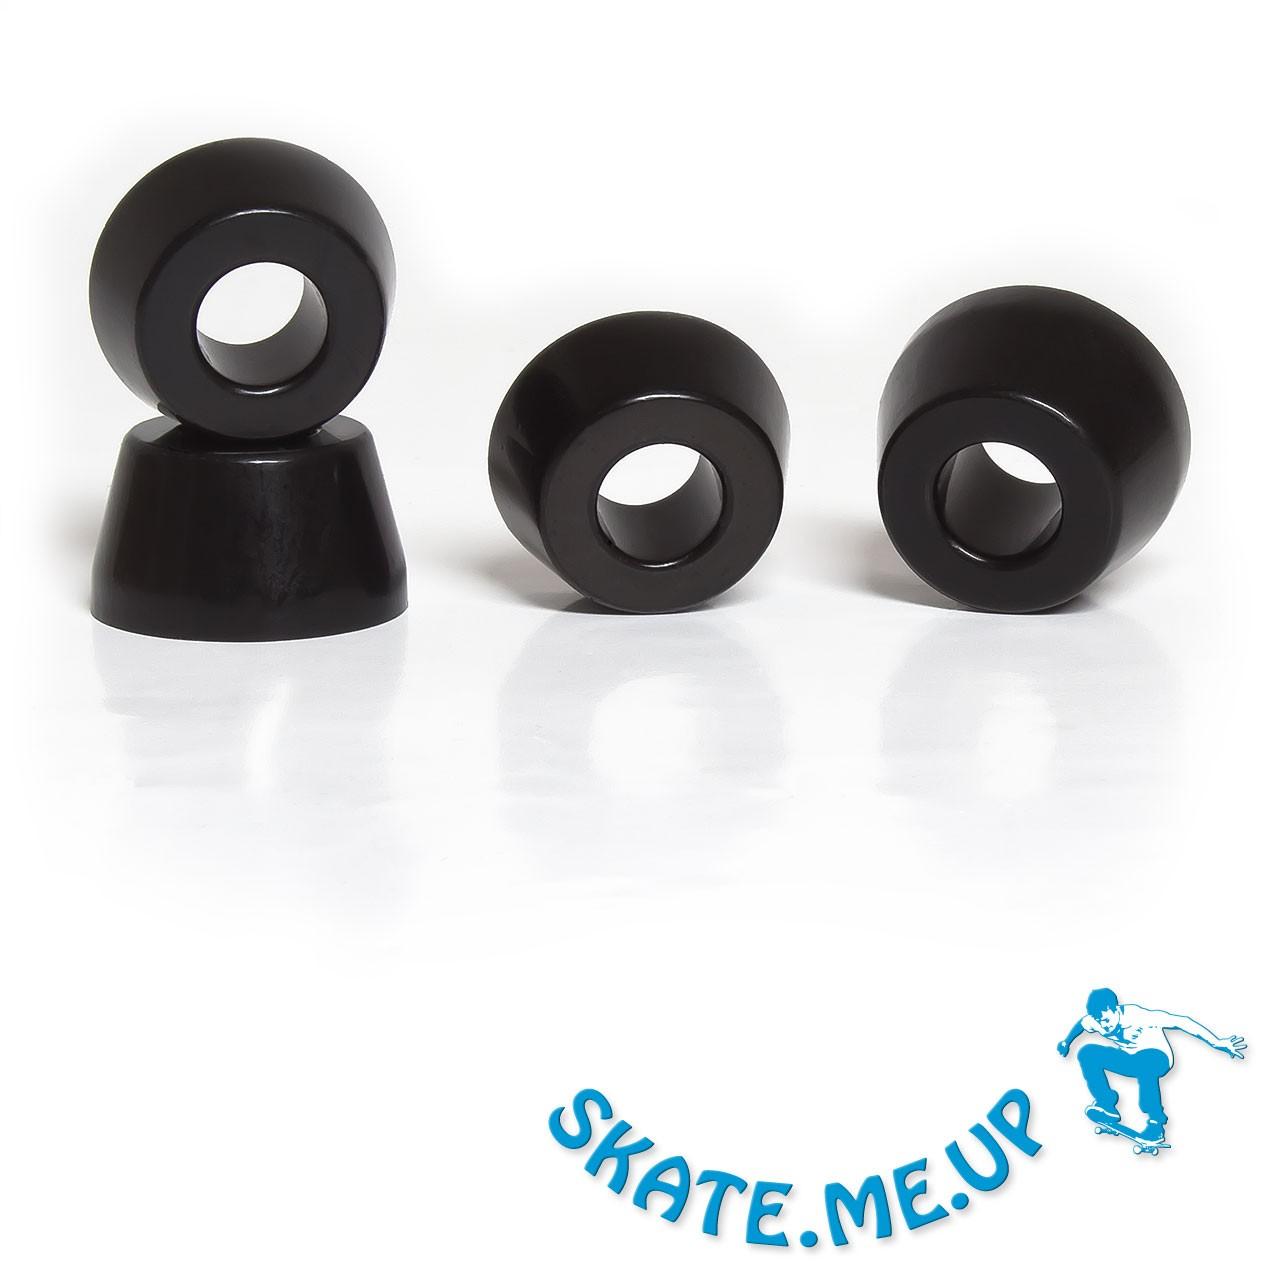 Skateboard / Longboard - Bushings - Lenkgummi Set für zwei Achsen - 85A schwarz konisch [weicher]